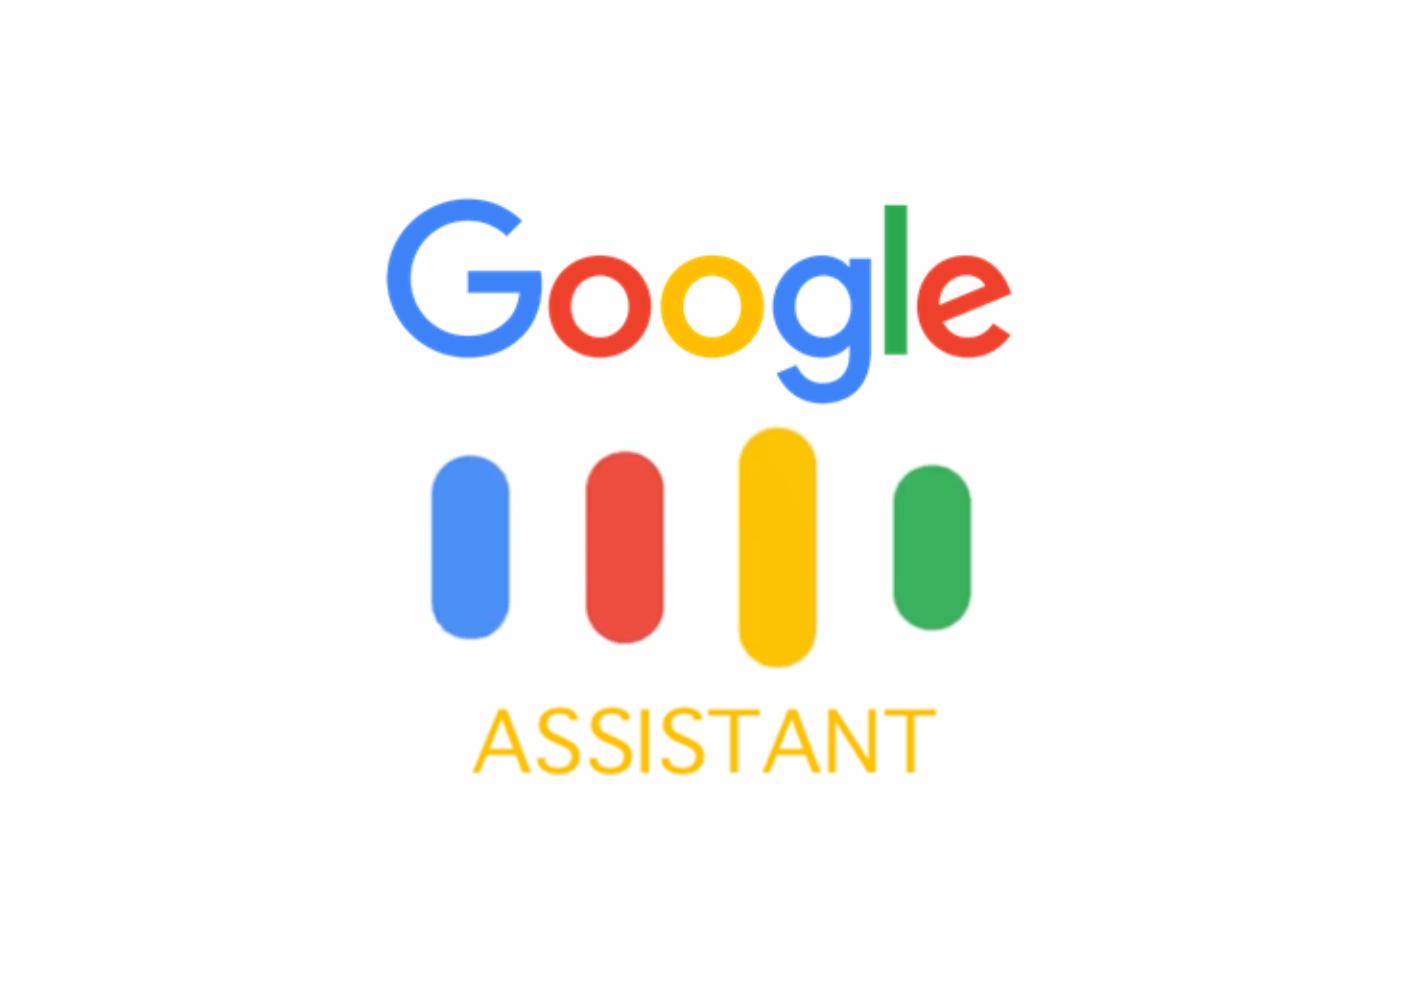 Scorciatoia per attivare Google Assistant!